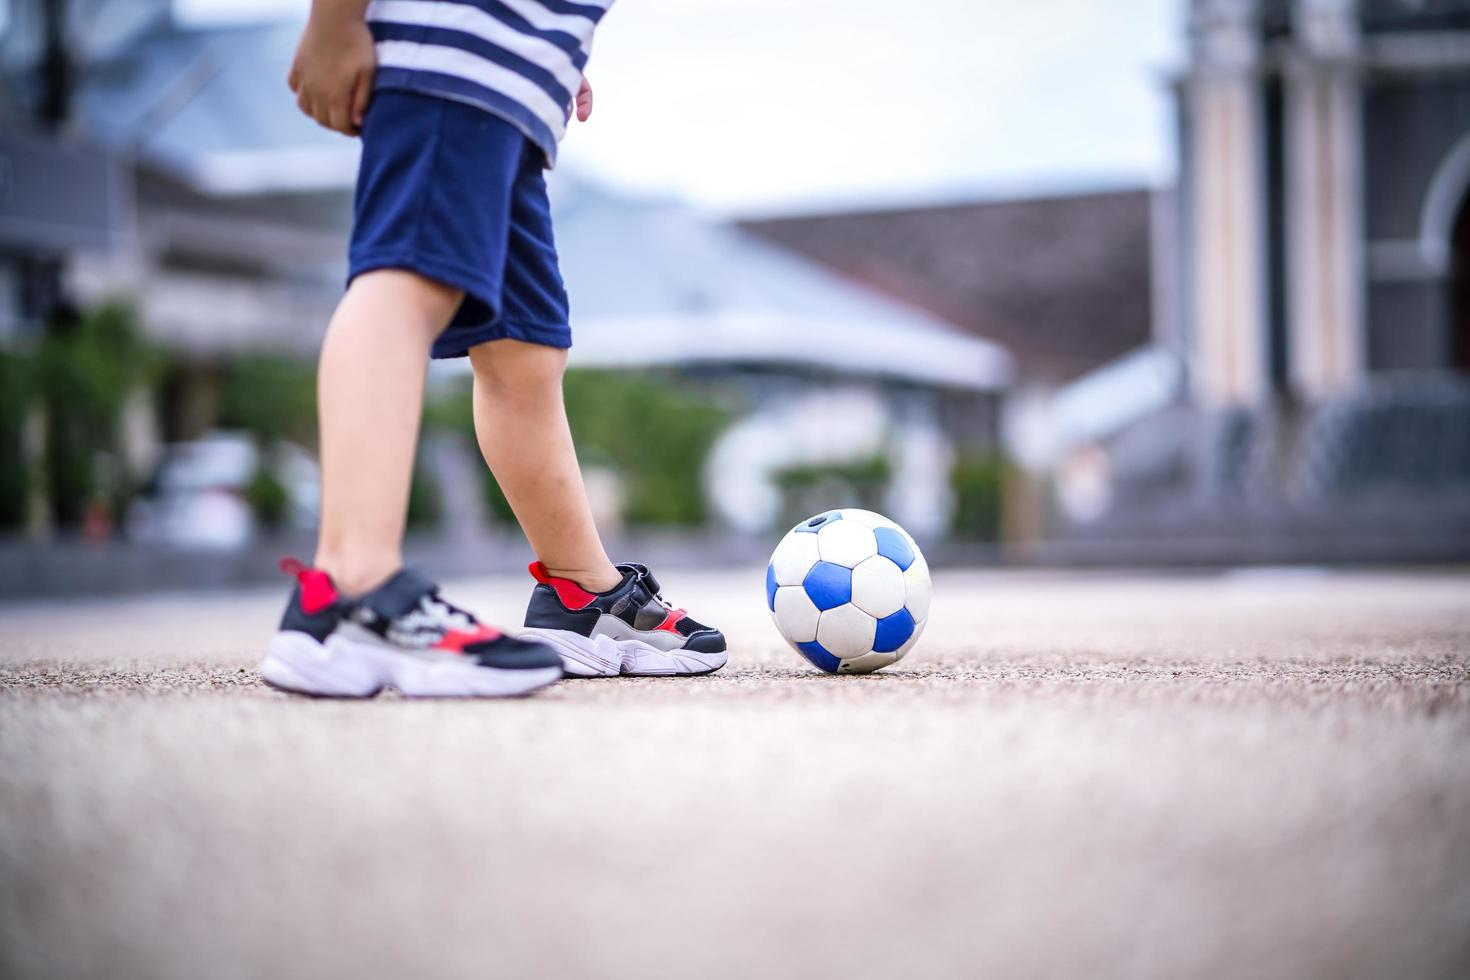 petit garçon avec ballon de foot photo